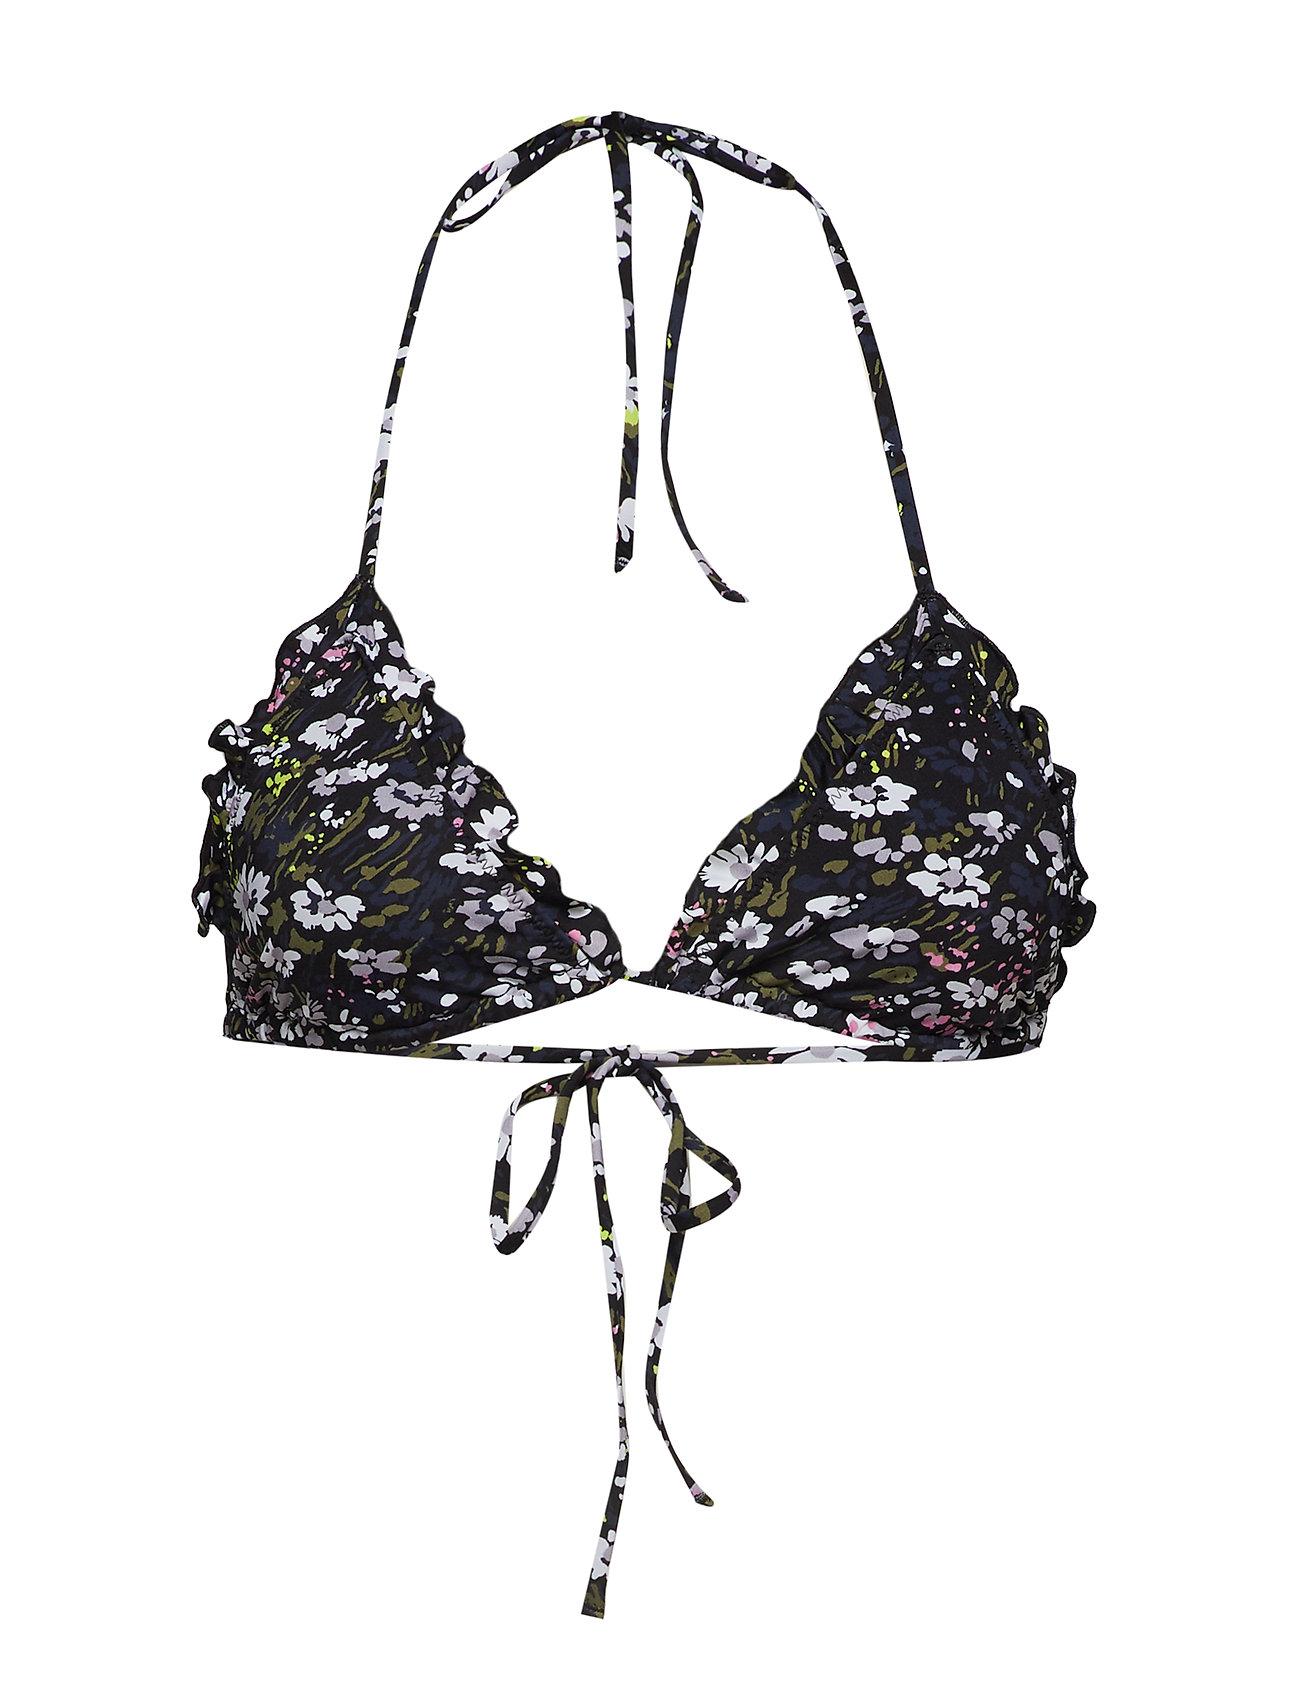 Ganni Recycled Fabric Swimwear